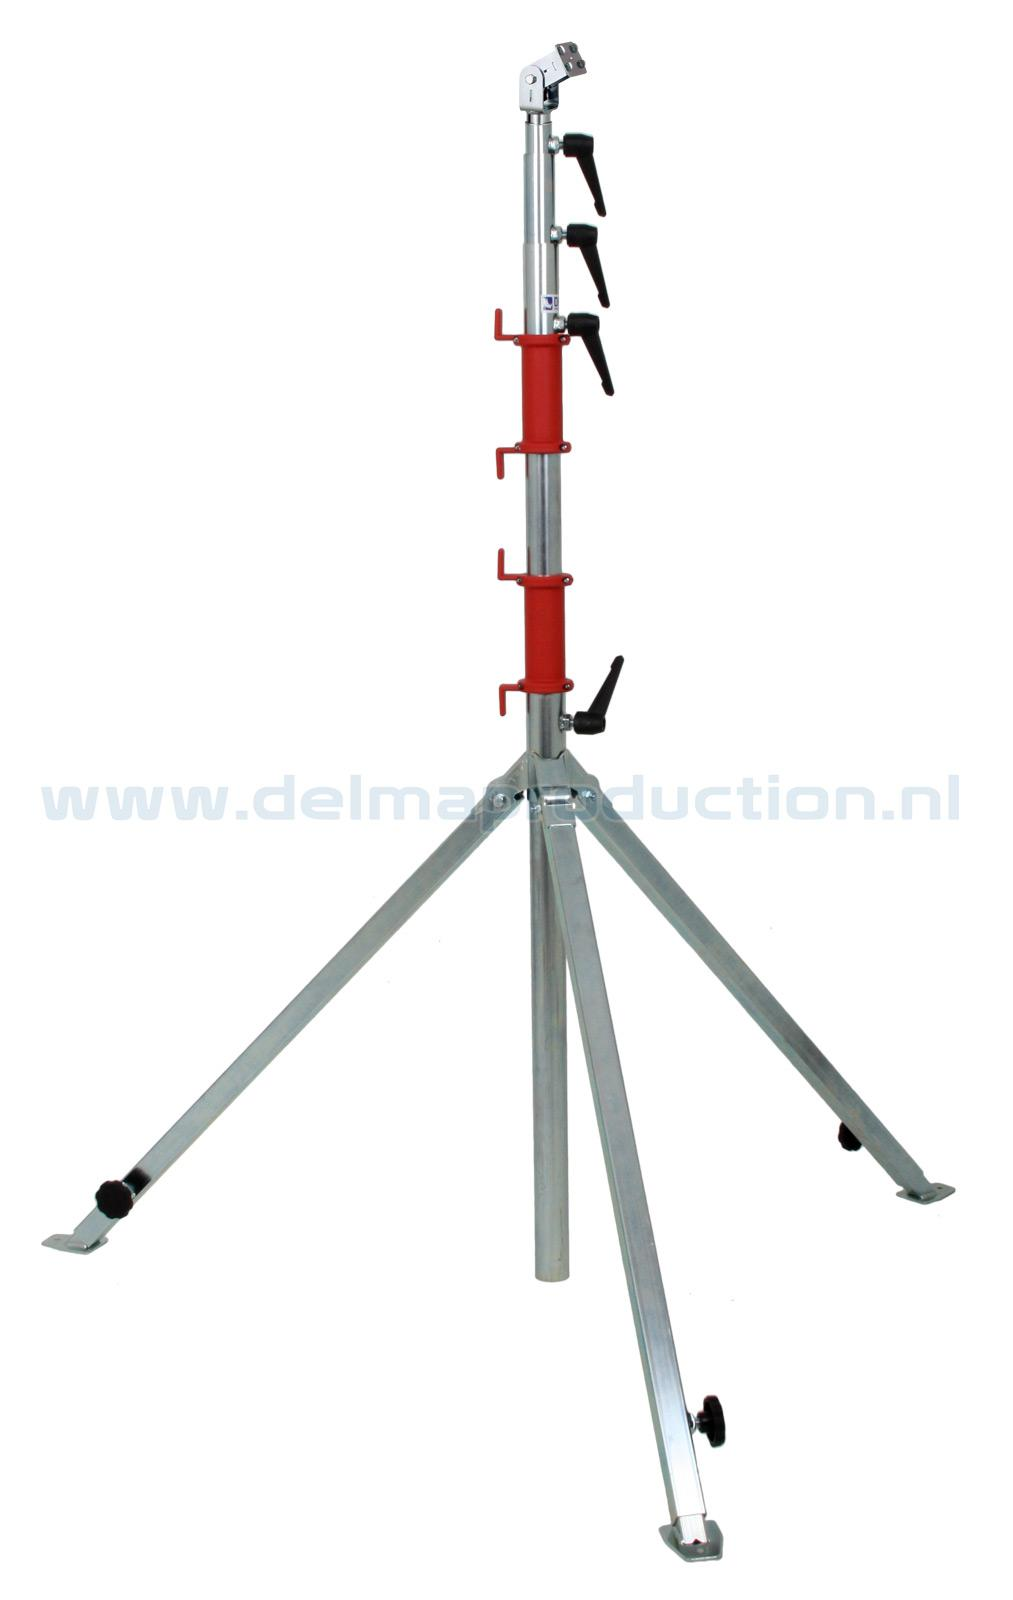 Bau-Teleskop-Stativ 5-teilig, verstellbares Fußgestell, Quick Release System